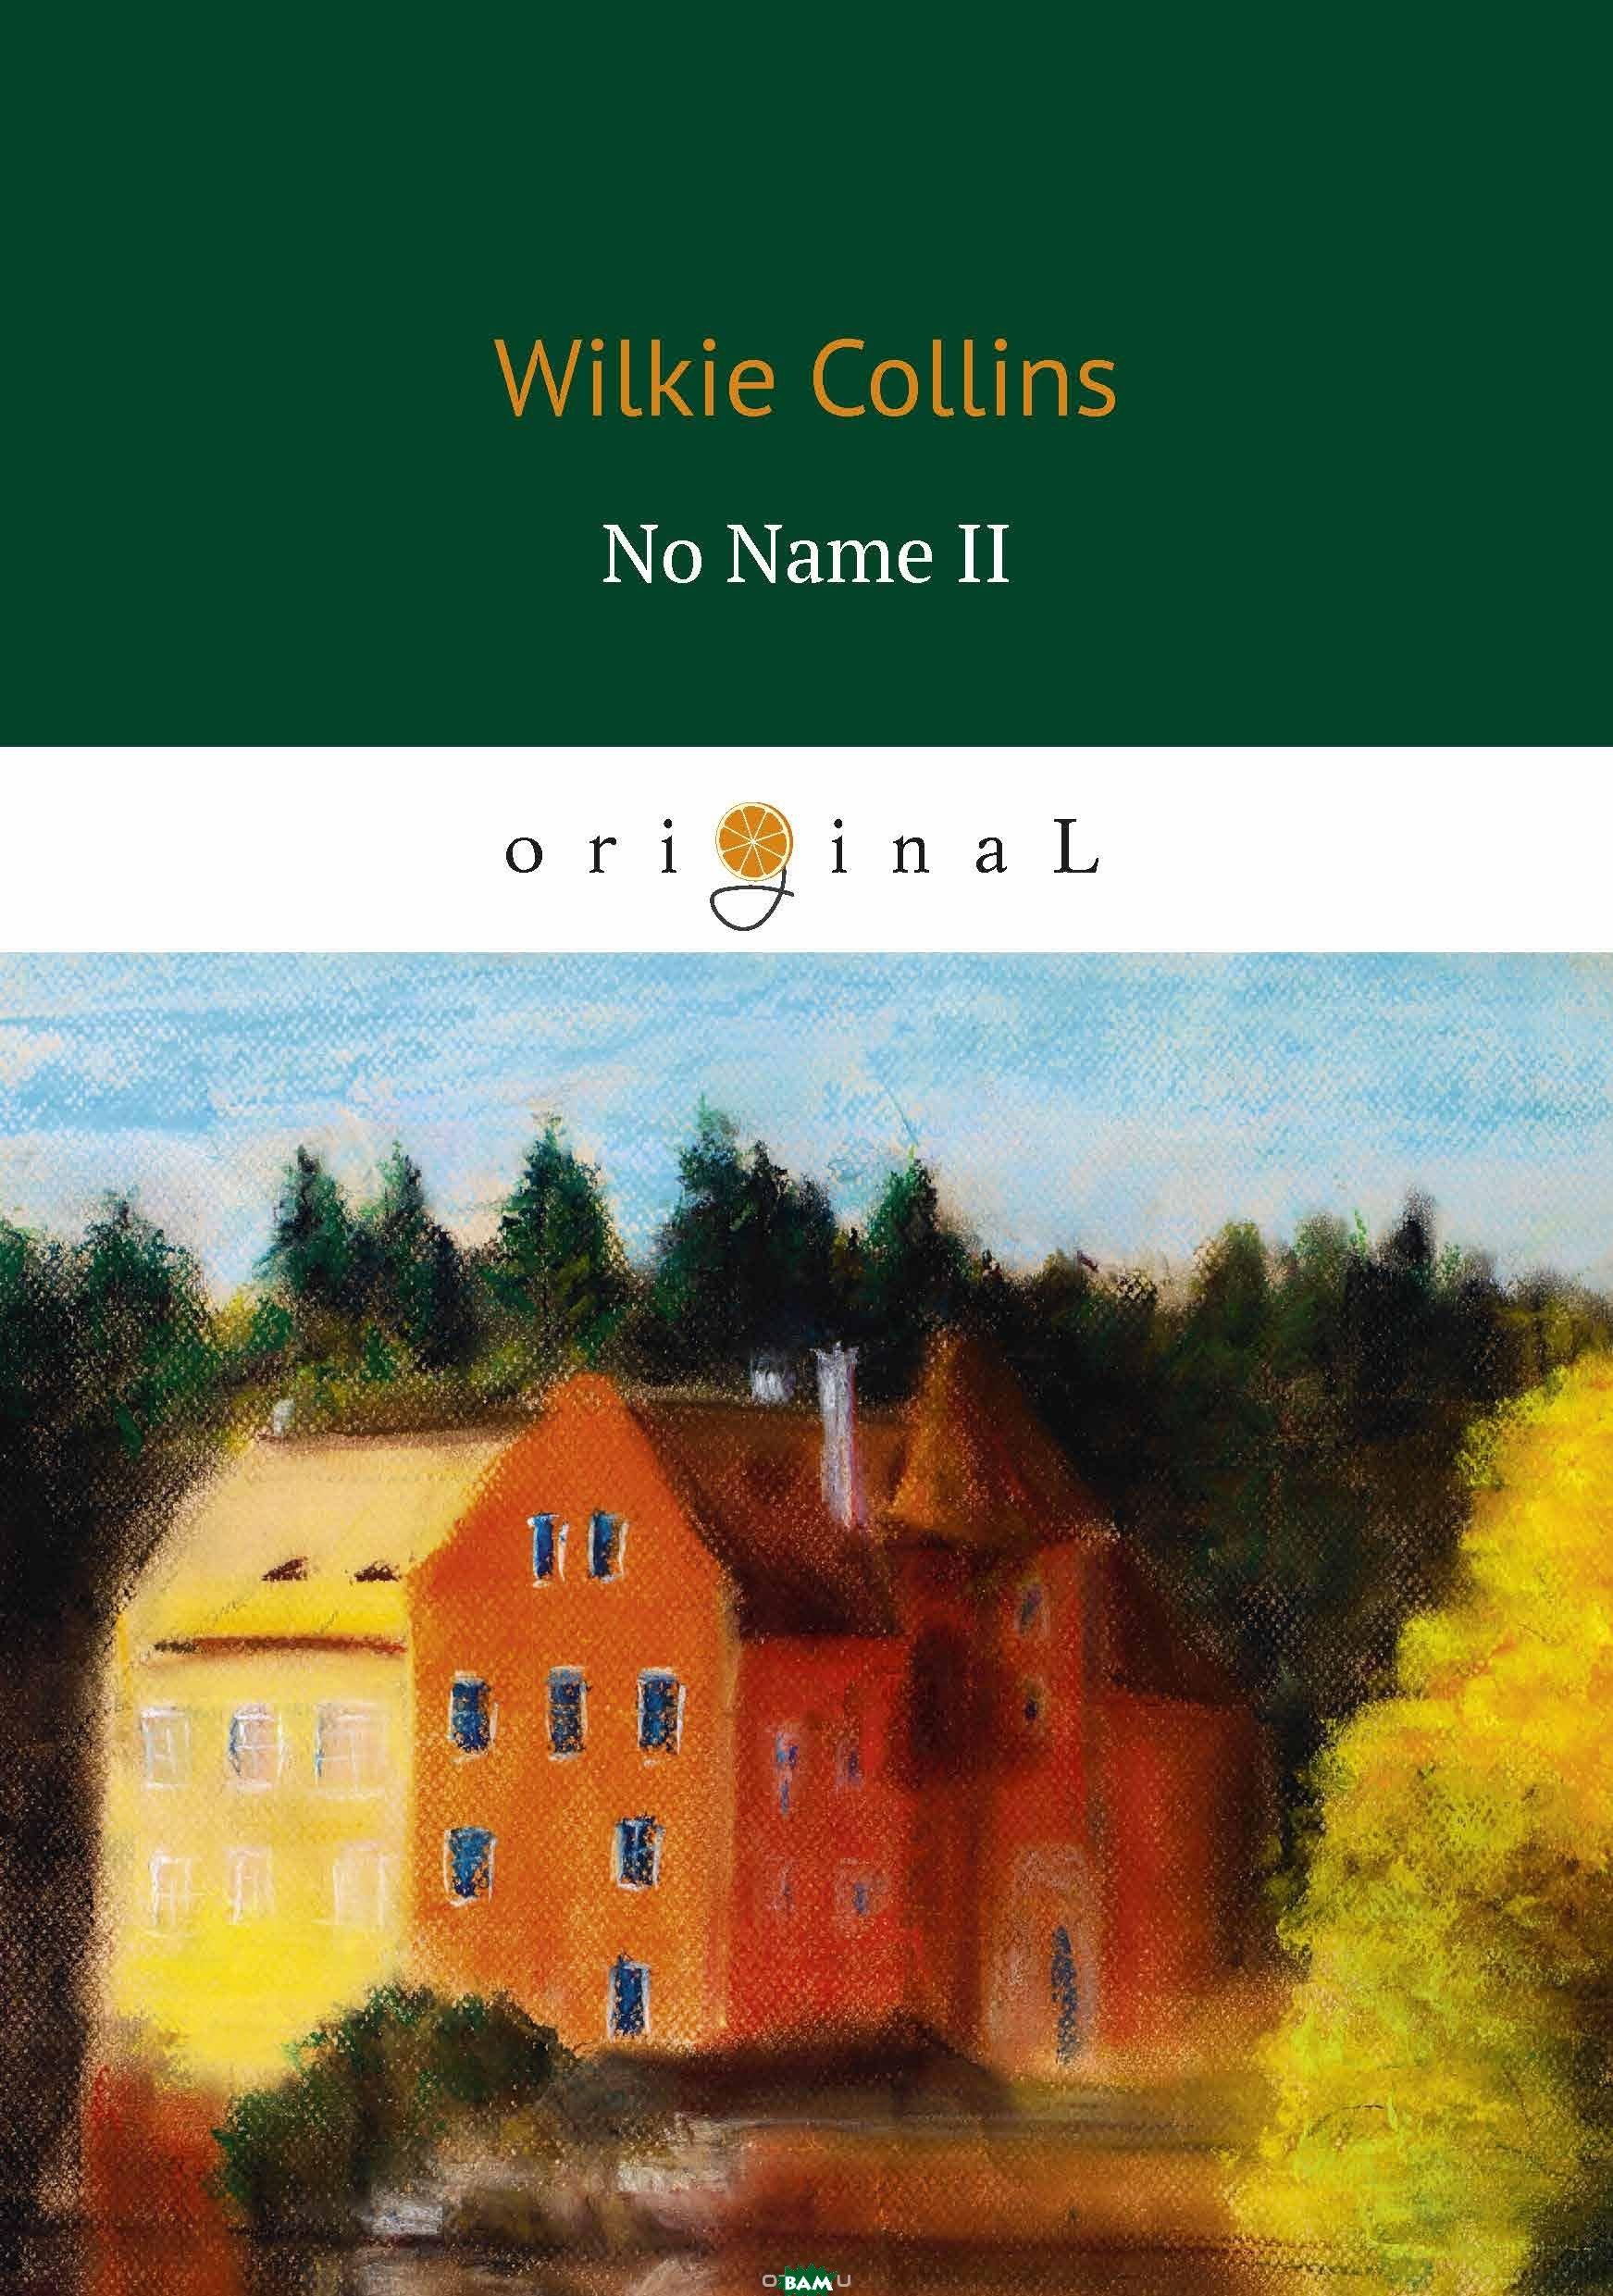 Купить No Name II, T8RUGRAM, Collins Wilkie, 978-5-521-06881-4